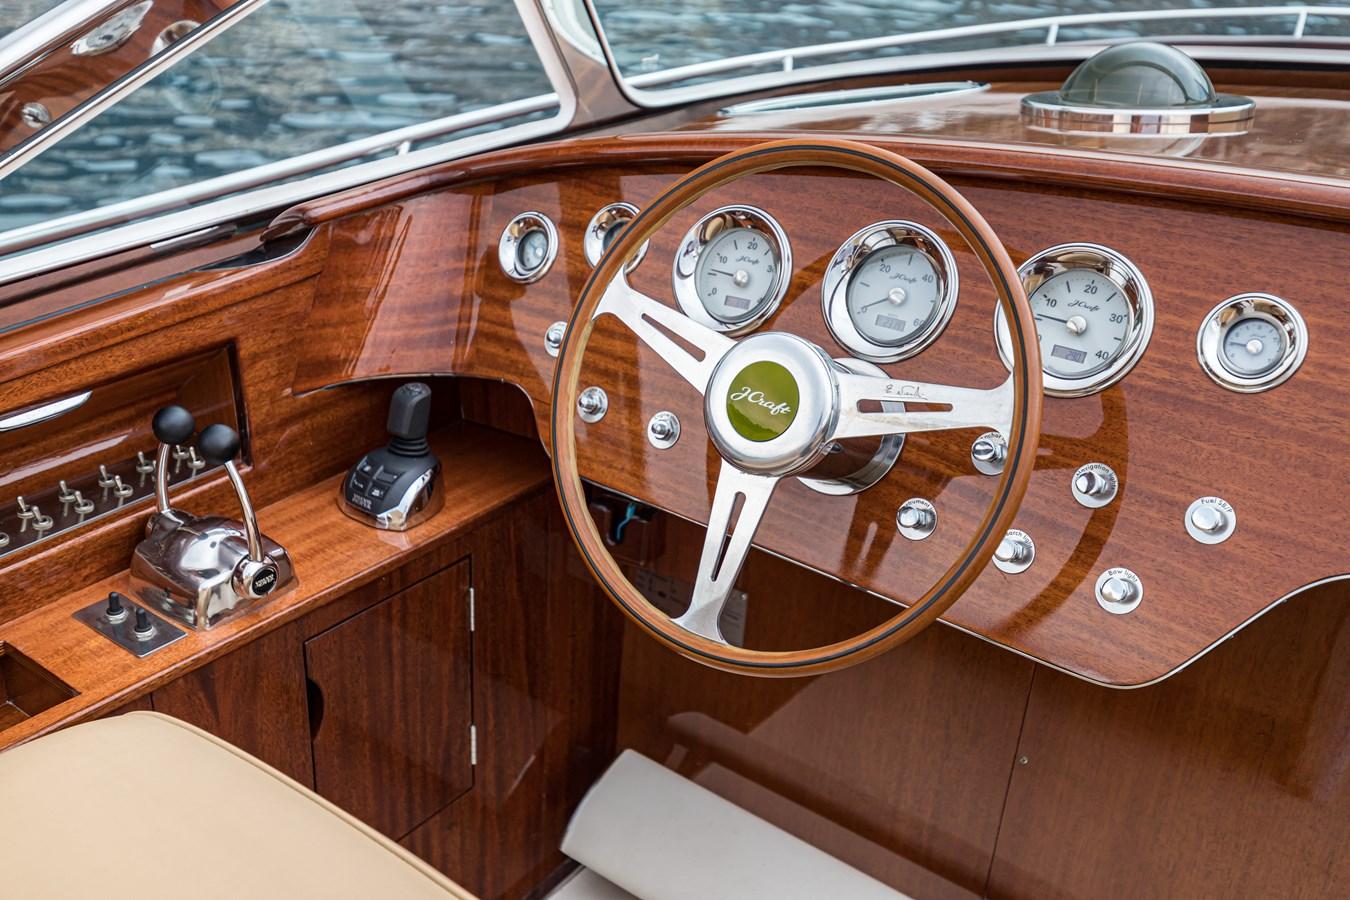 9 2010 J CRAFT Torpedo Motor Yacht 2674005